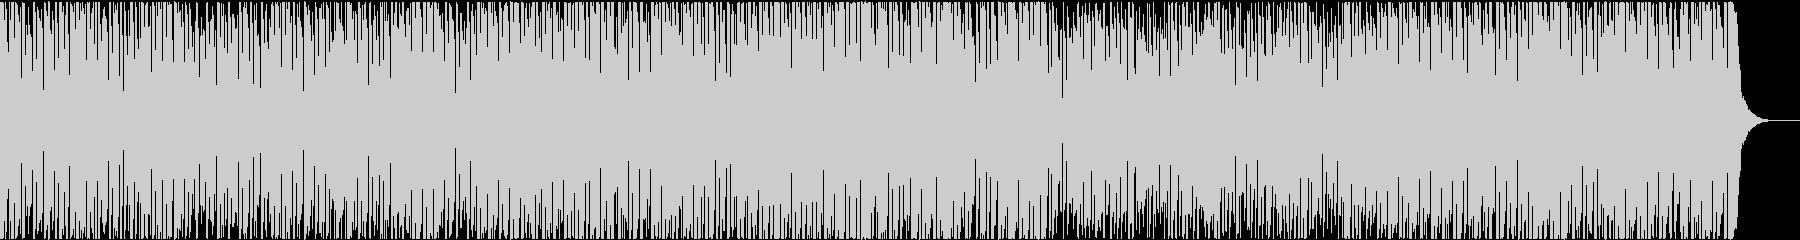 News6 16bit44kHzVerの未再生の波形